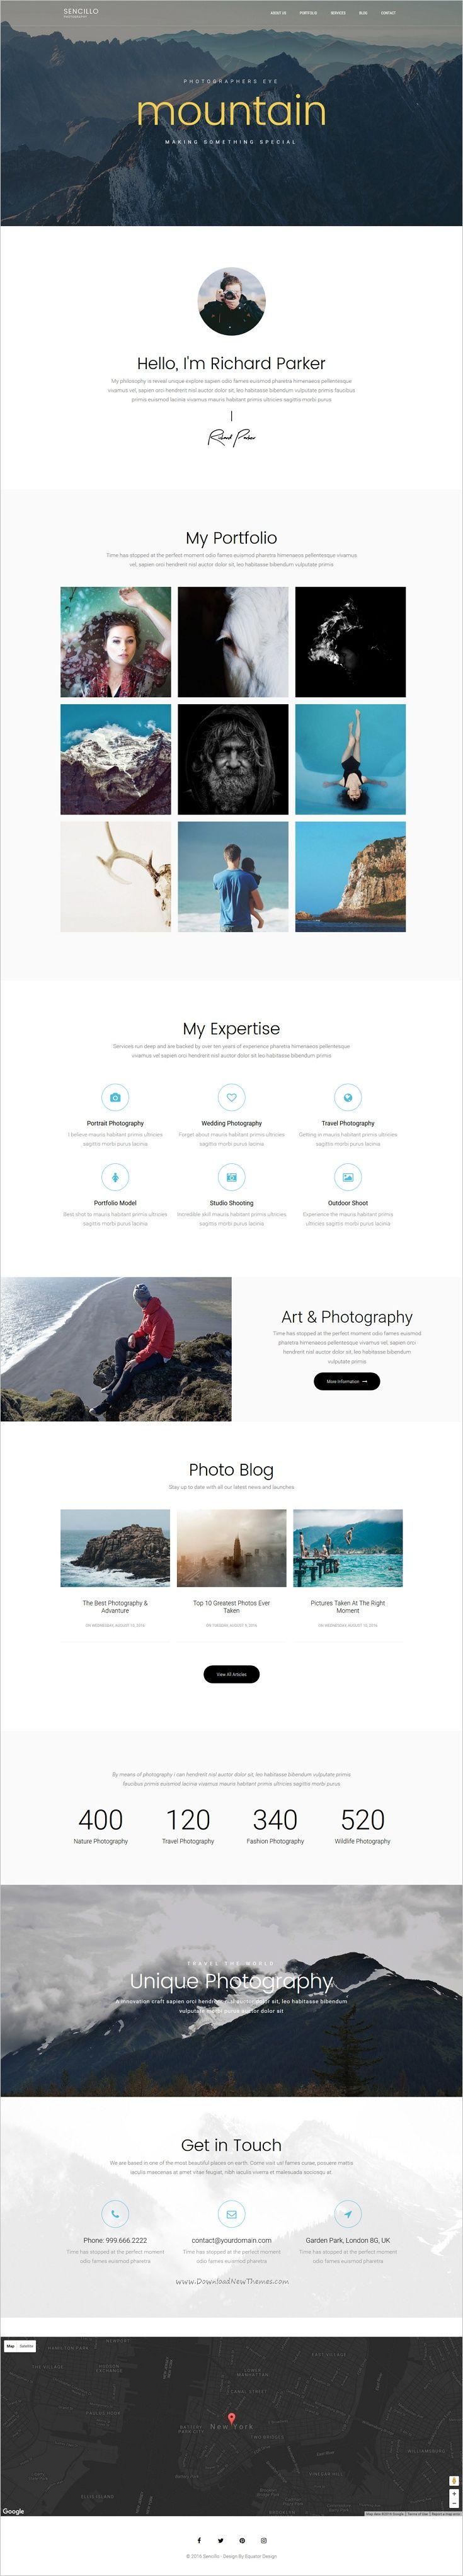 Sencillo is a creative responsive #WordPress #template for #photographer #portfolio, blog or personal website based on Layers Framework download now➩ https://themeforest.net/item/sencillo-creative-portfolioblogpersonal-wordpress-theme/17920500?ref=Datasata